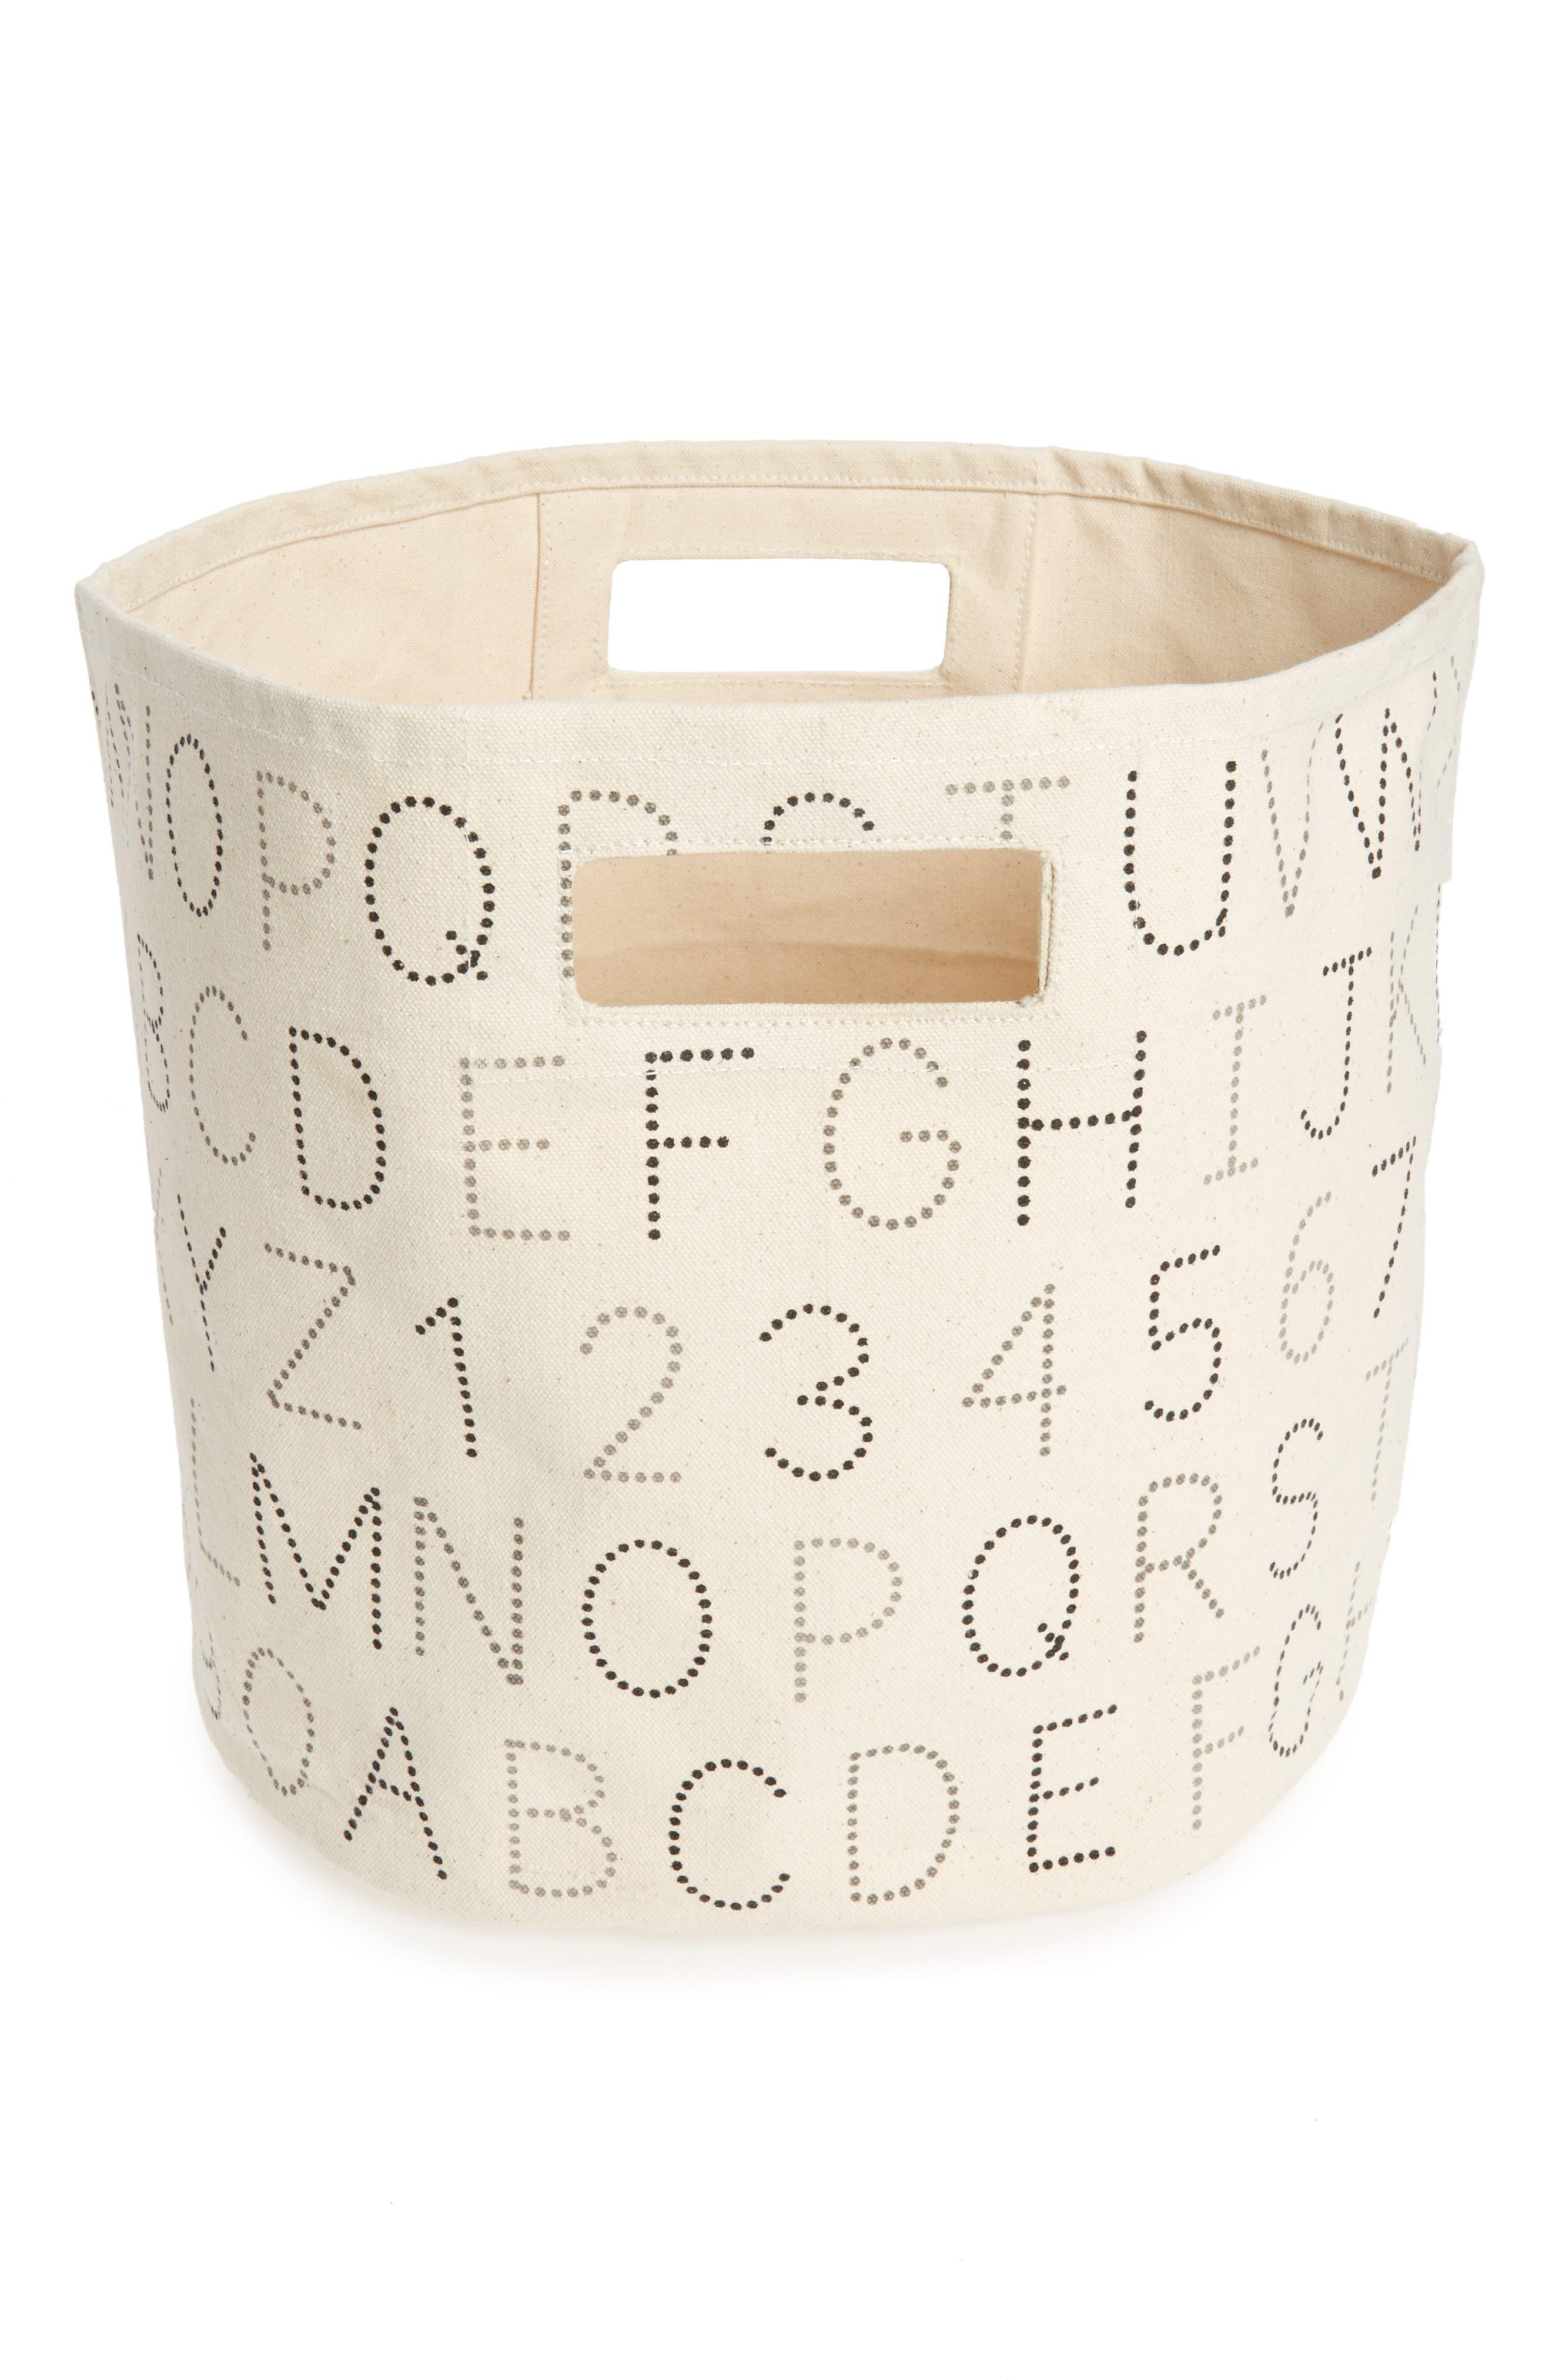 Main Image - Petit Pehr Alphabet Print Canvas Bin